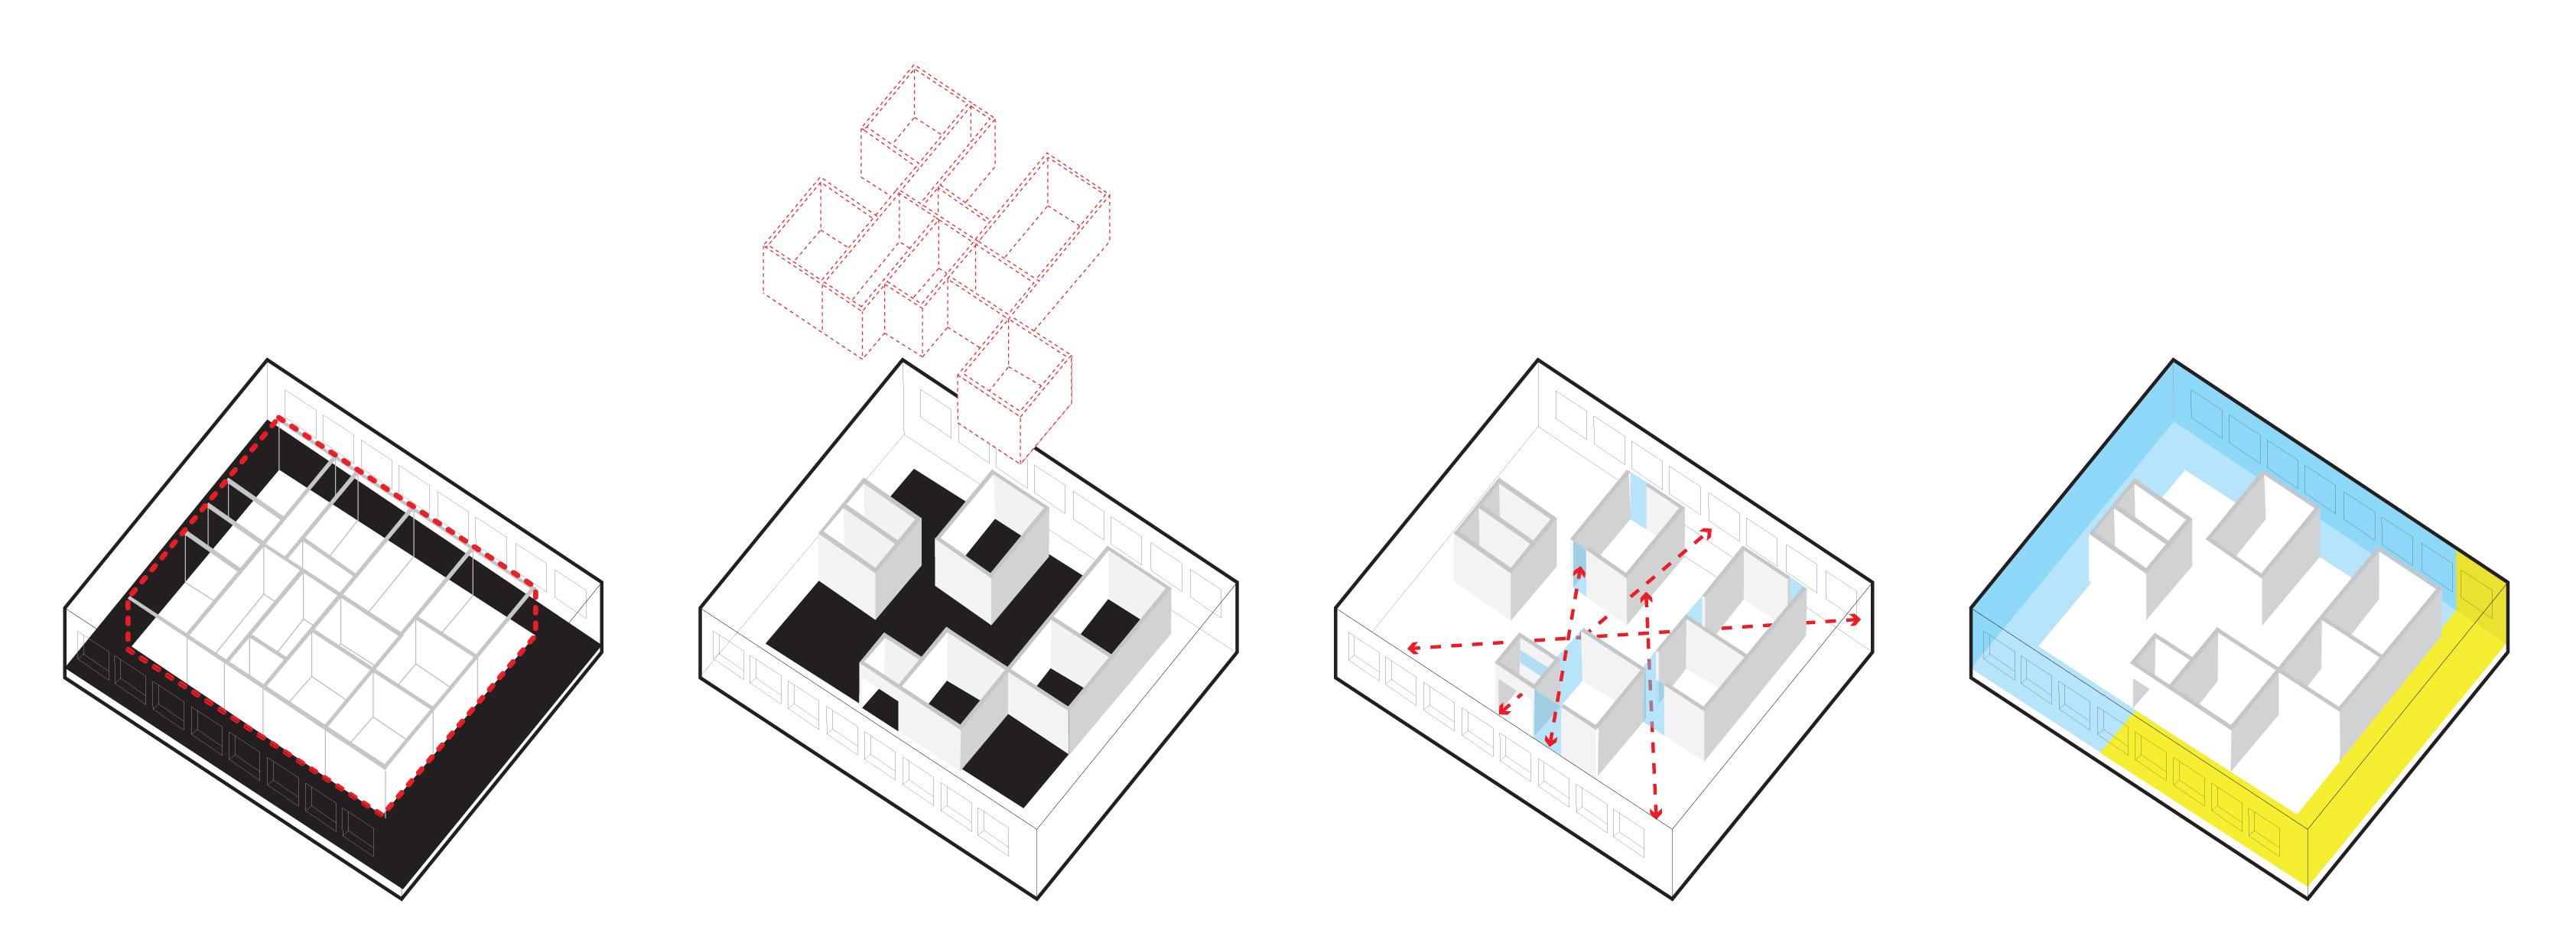 <p>Diagrams – Consulaat Indonesië, Den Haag – Parthesius, Krill o.r.c.a. + SHAU</p>